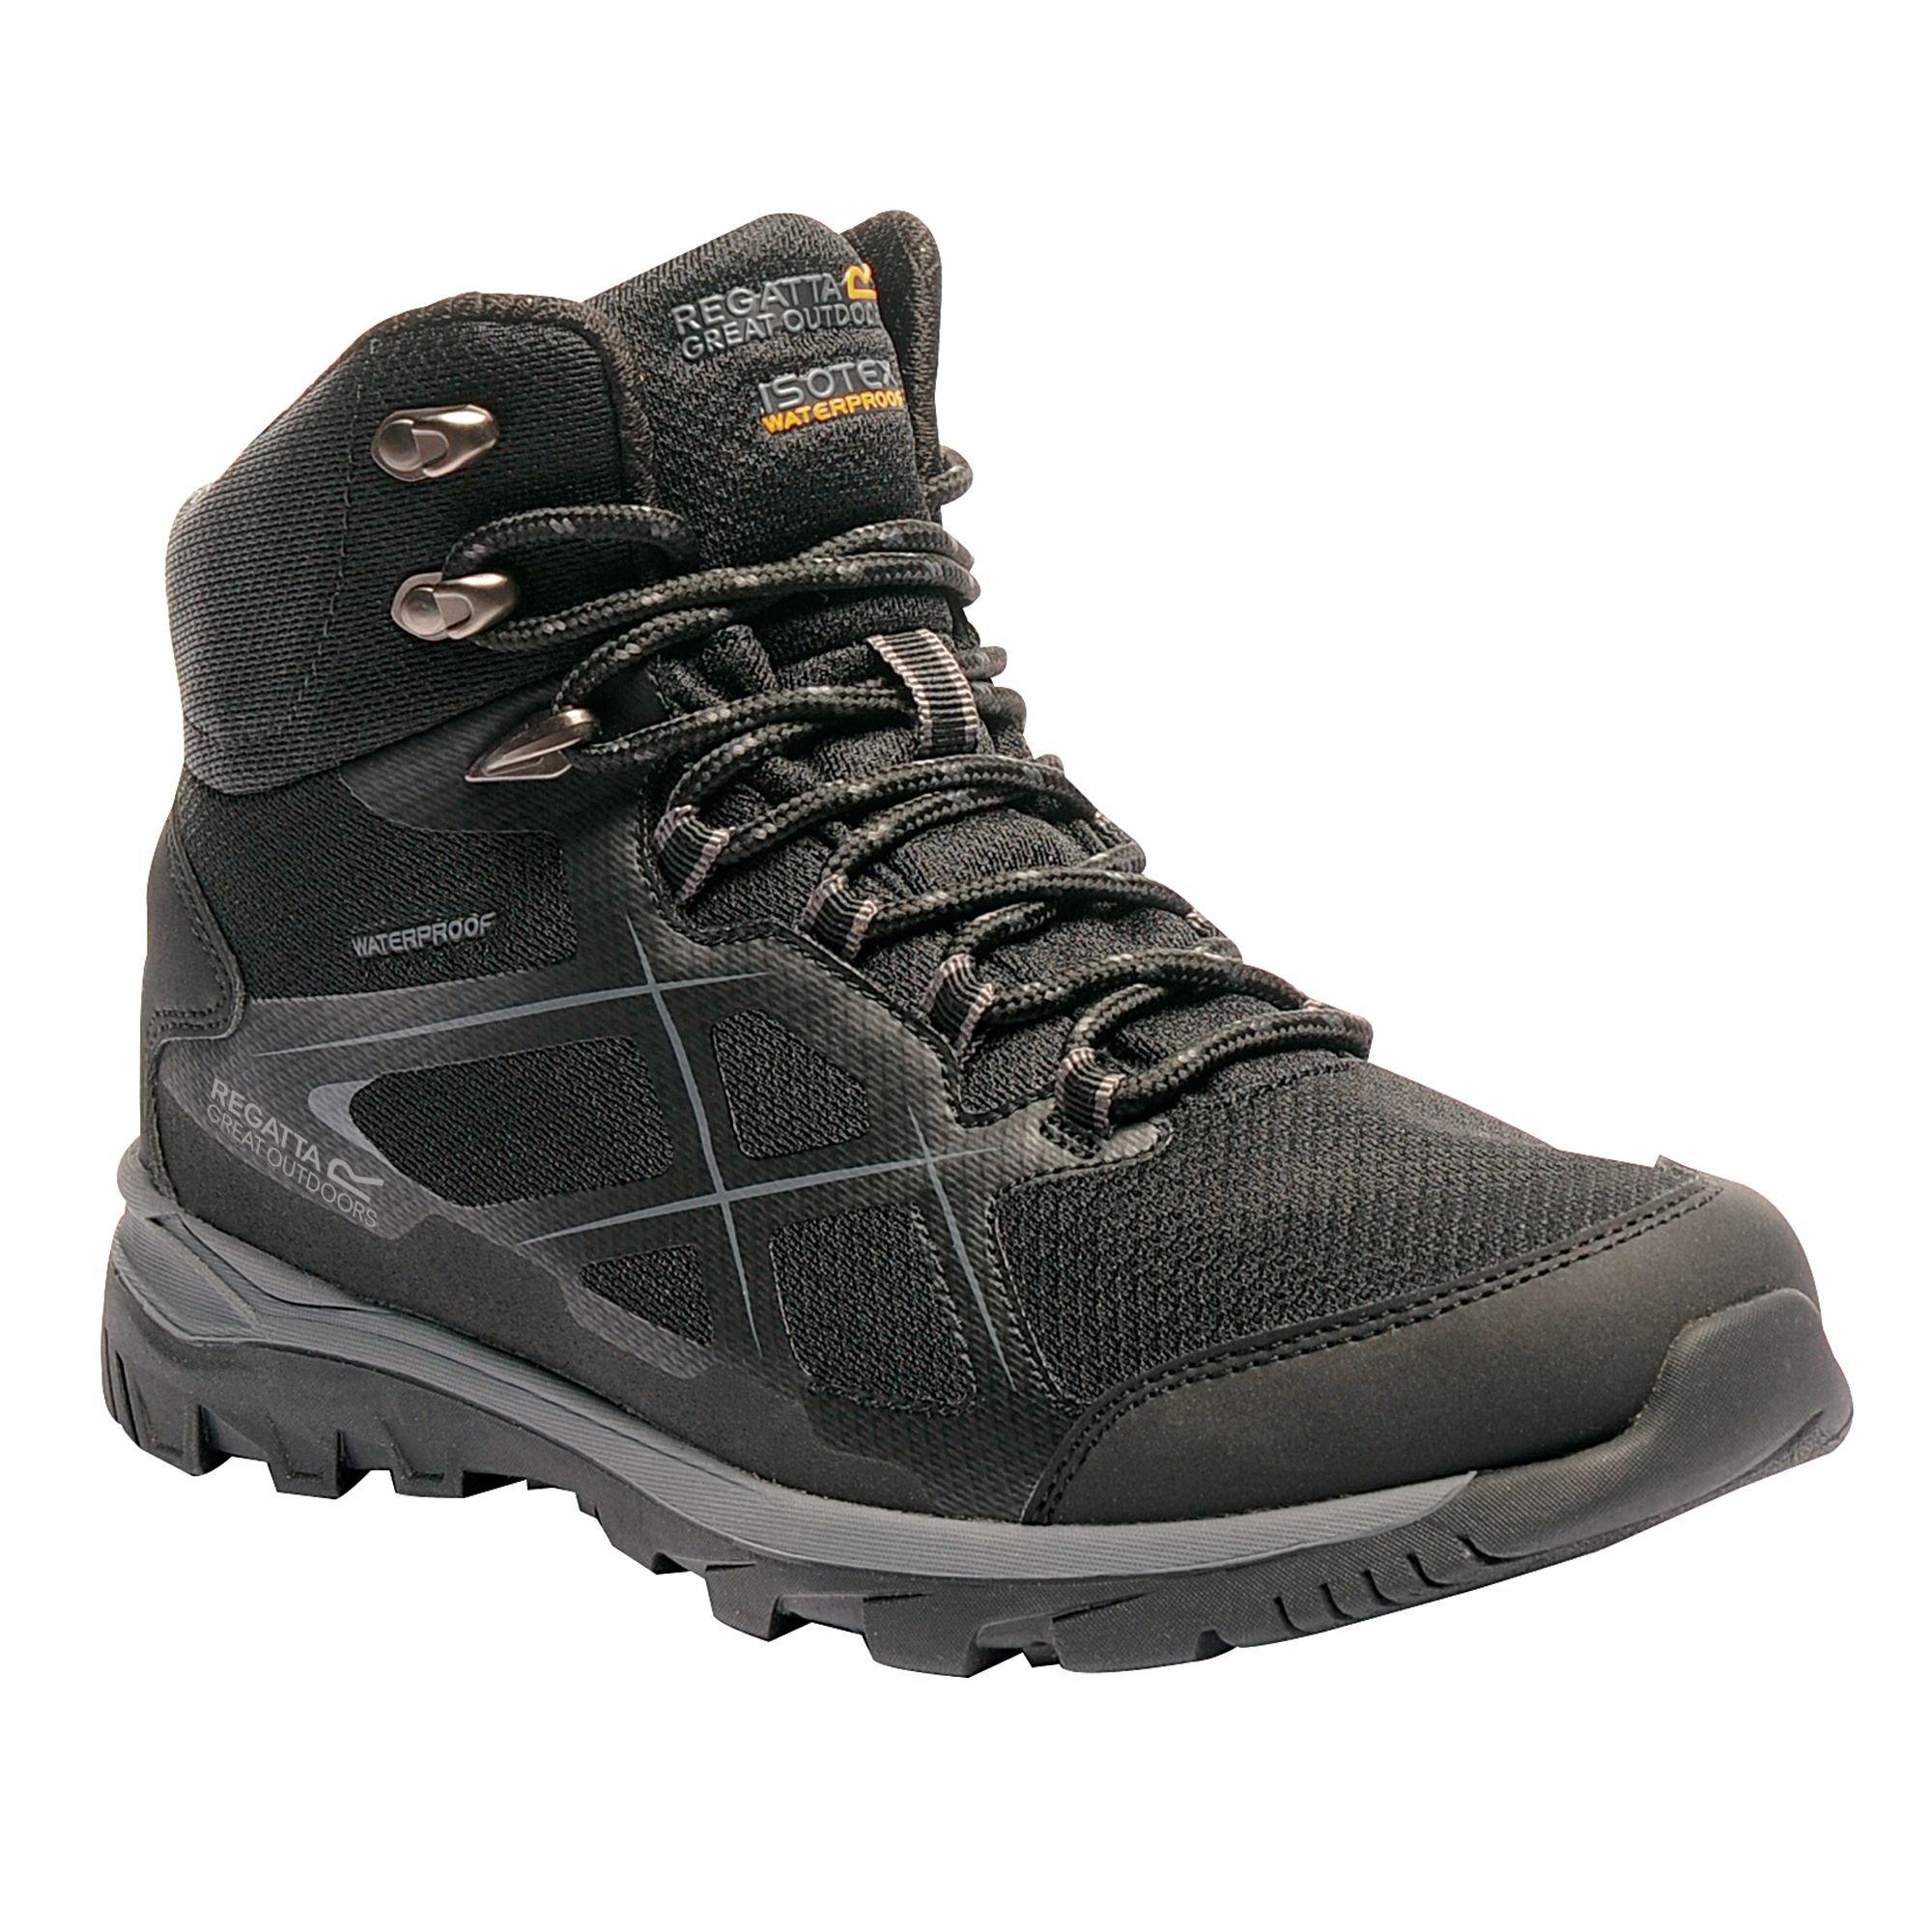 Regatta Great Outdoors Mens Kota Mid Walking Boot (10 US) (Navy Blazer/Lime Green) by Regatta (Image #3)